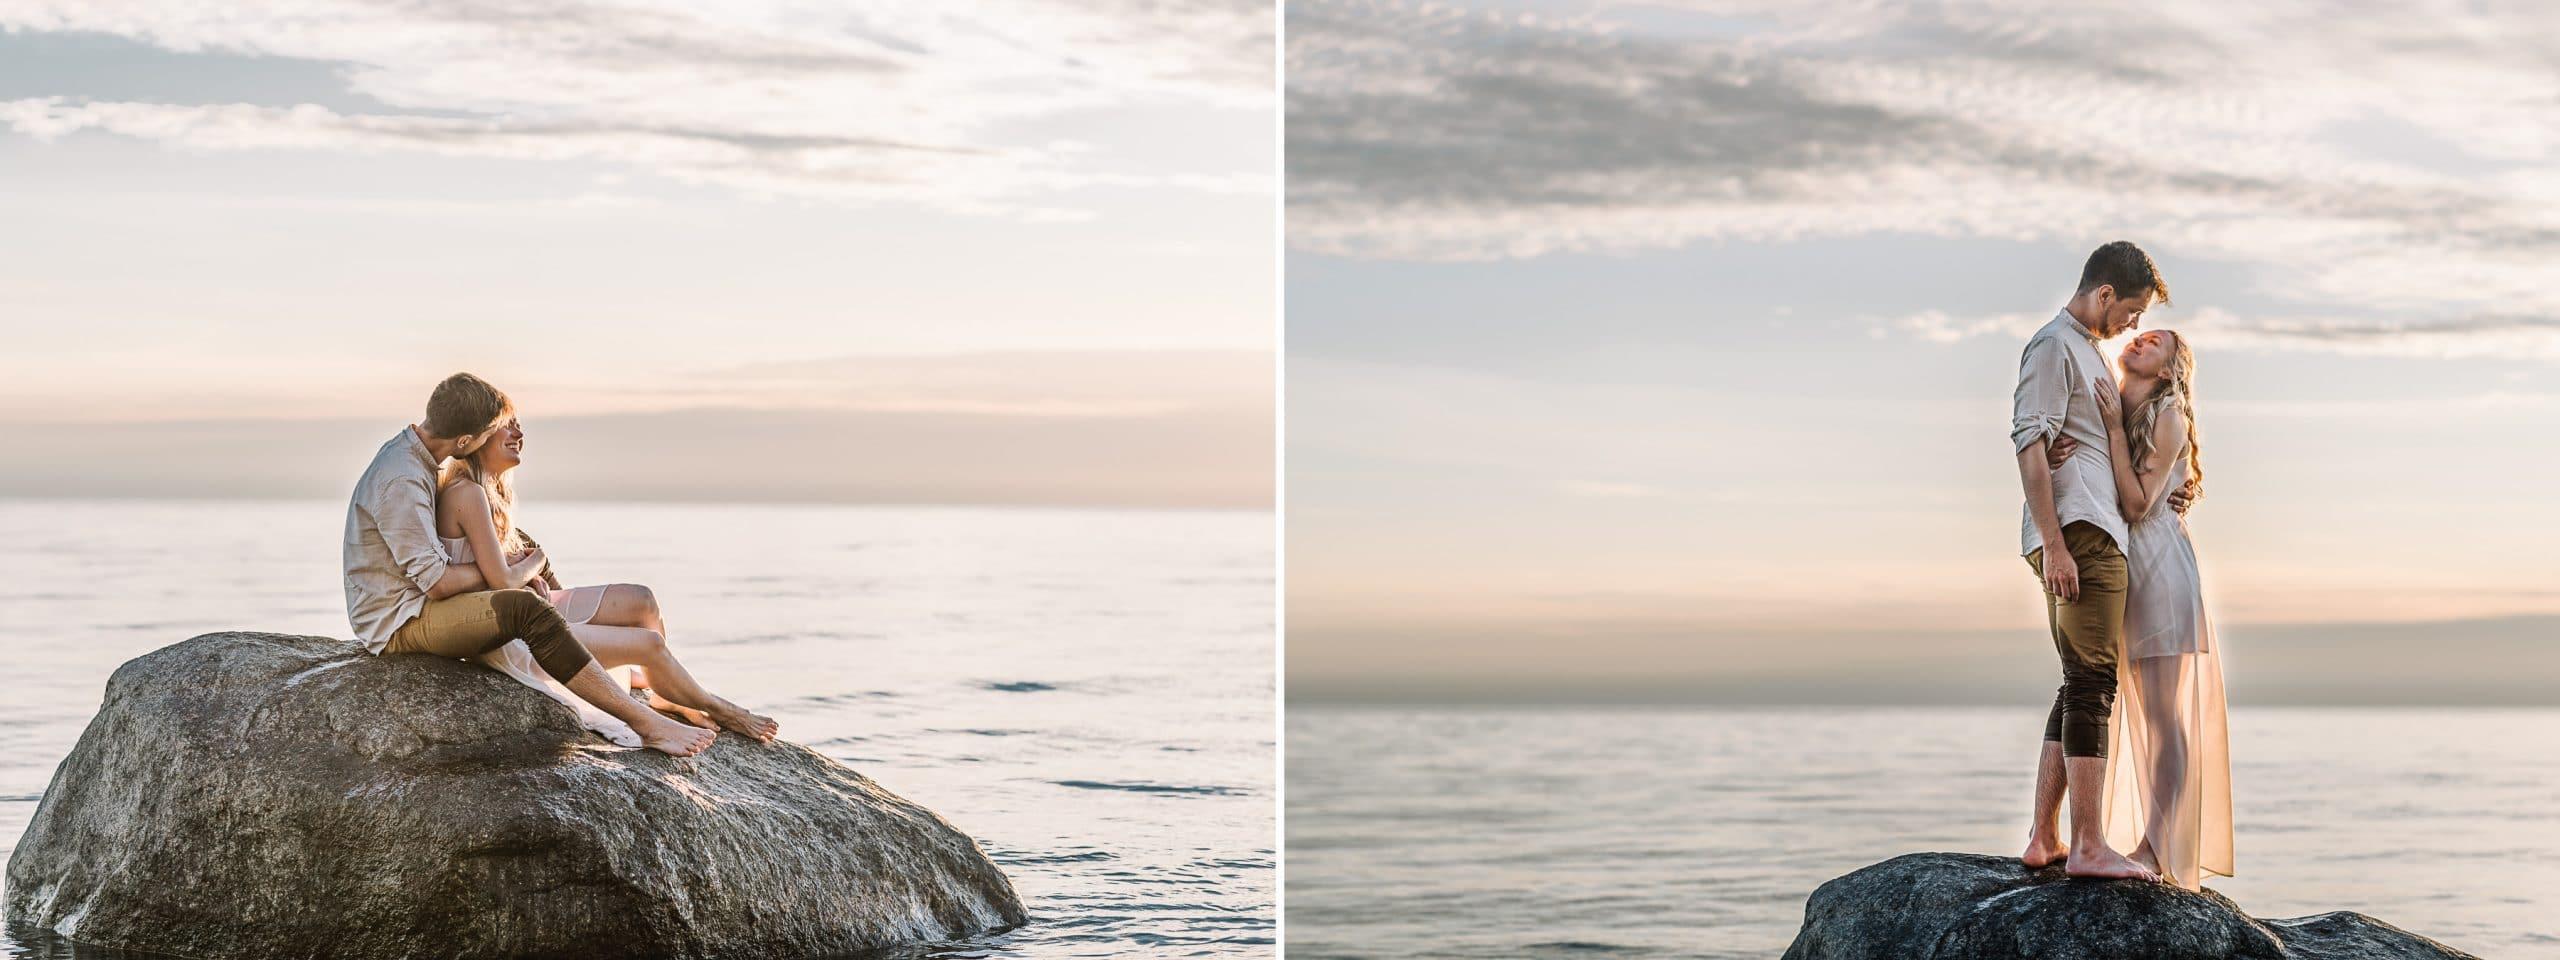 Poros fotosesija prie juros Olando kepureje